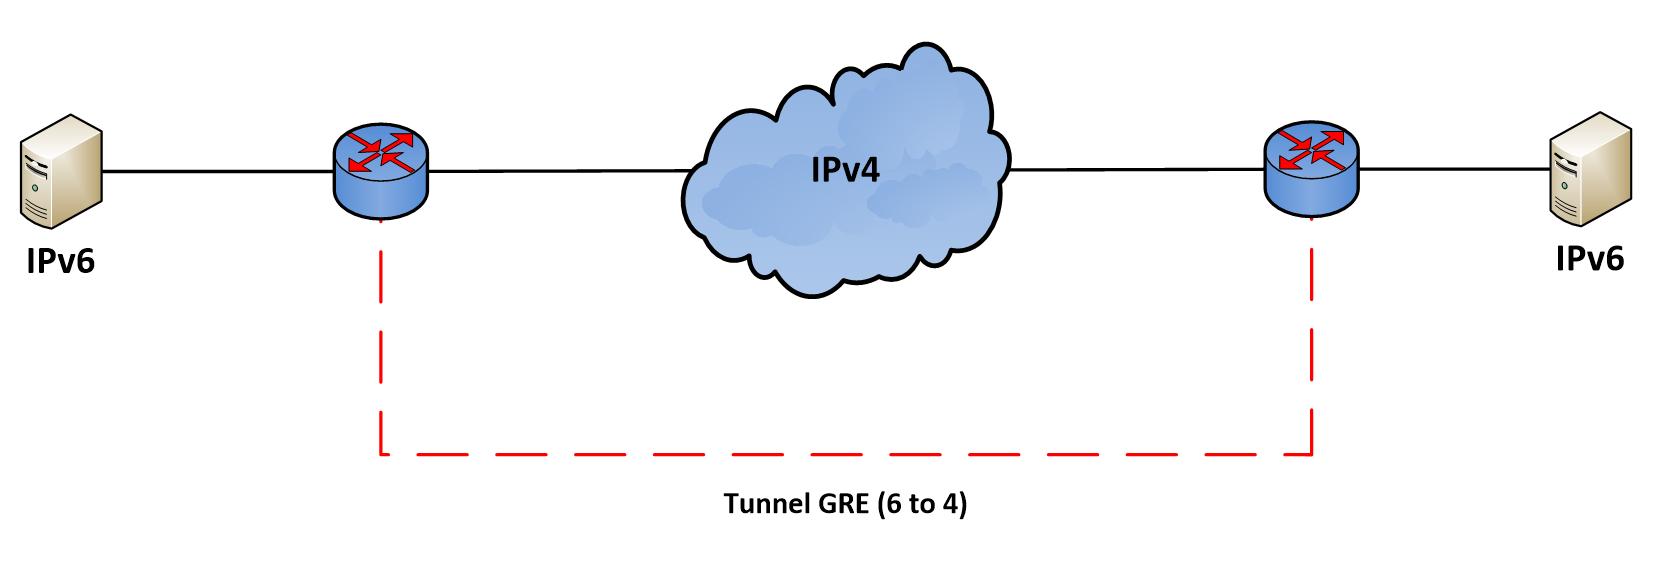 Tunneling IPv6